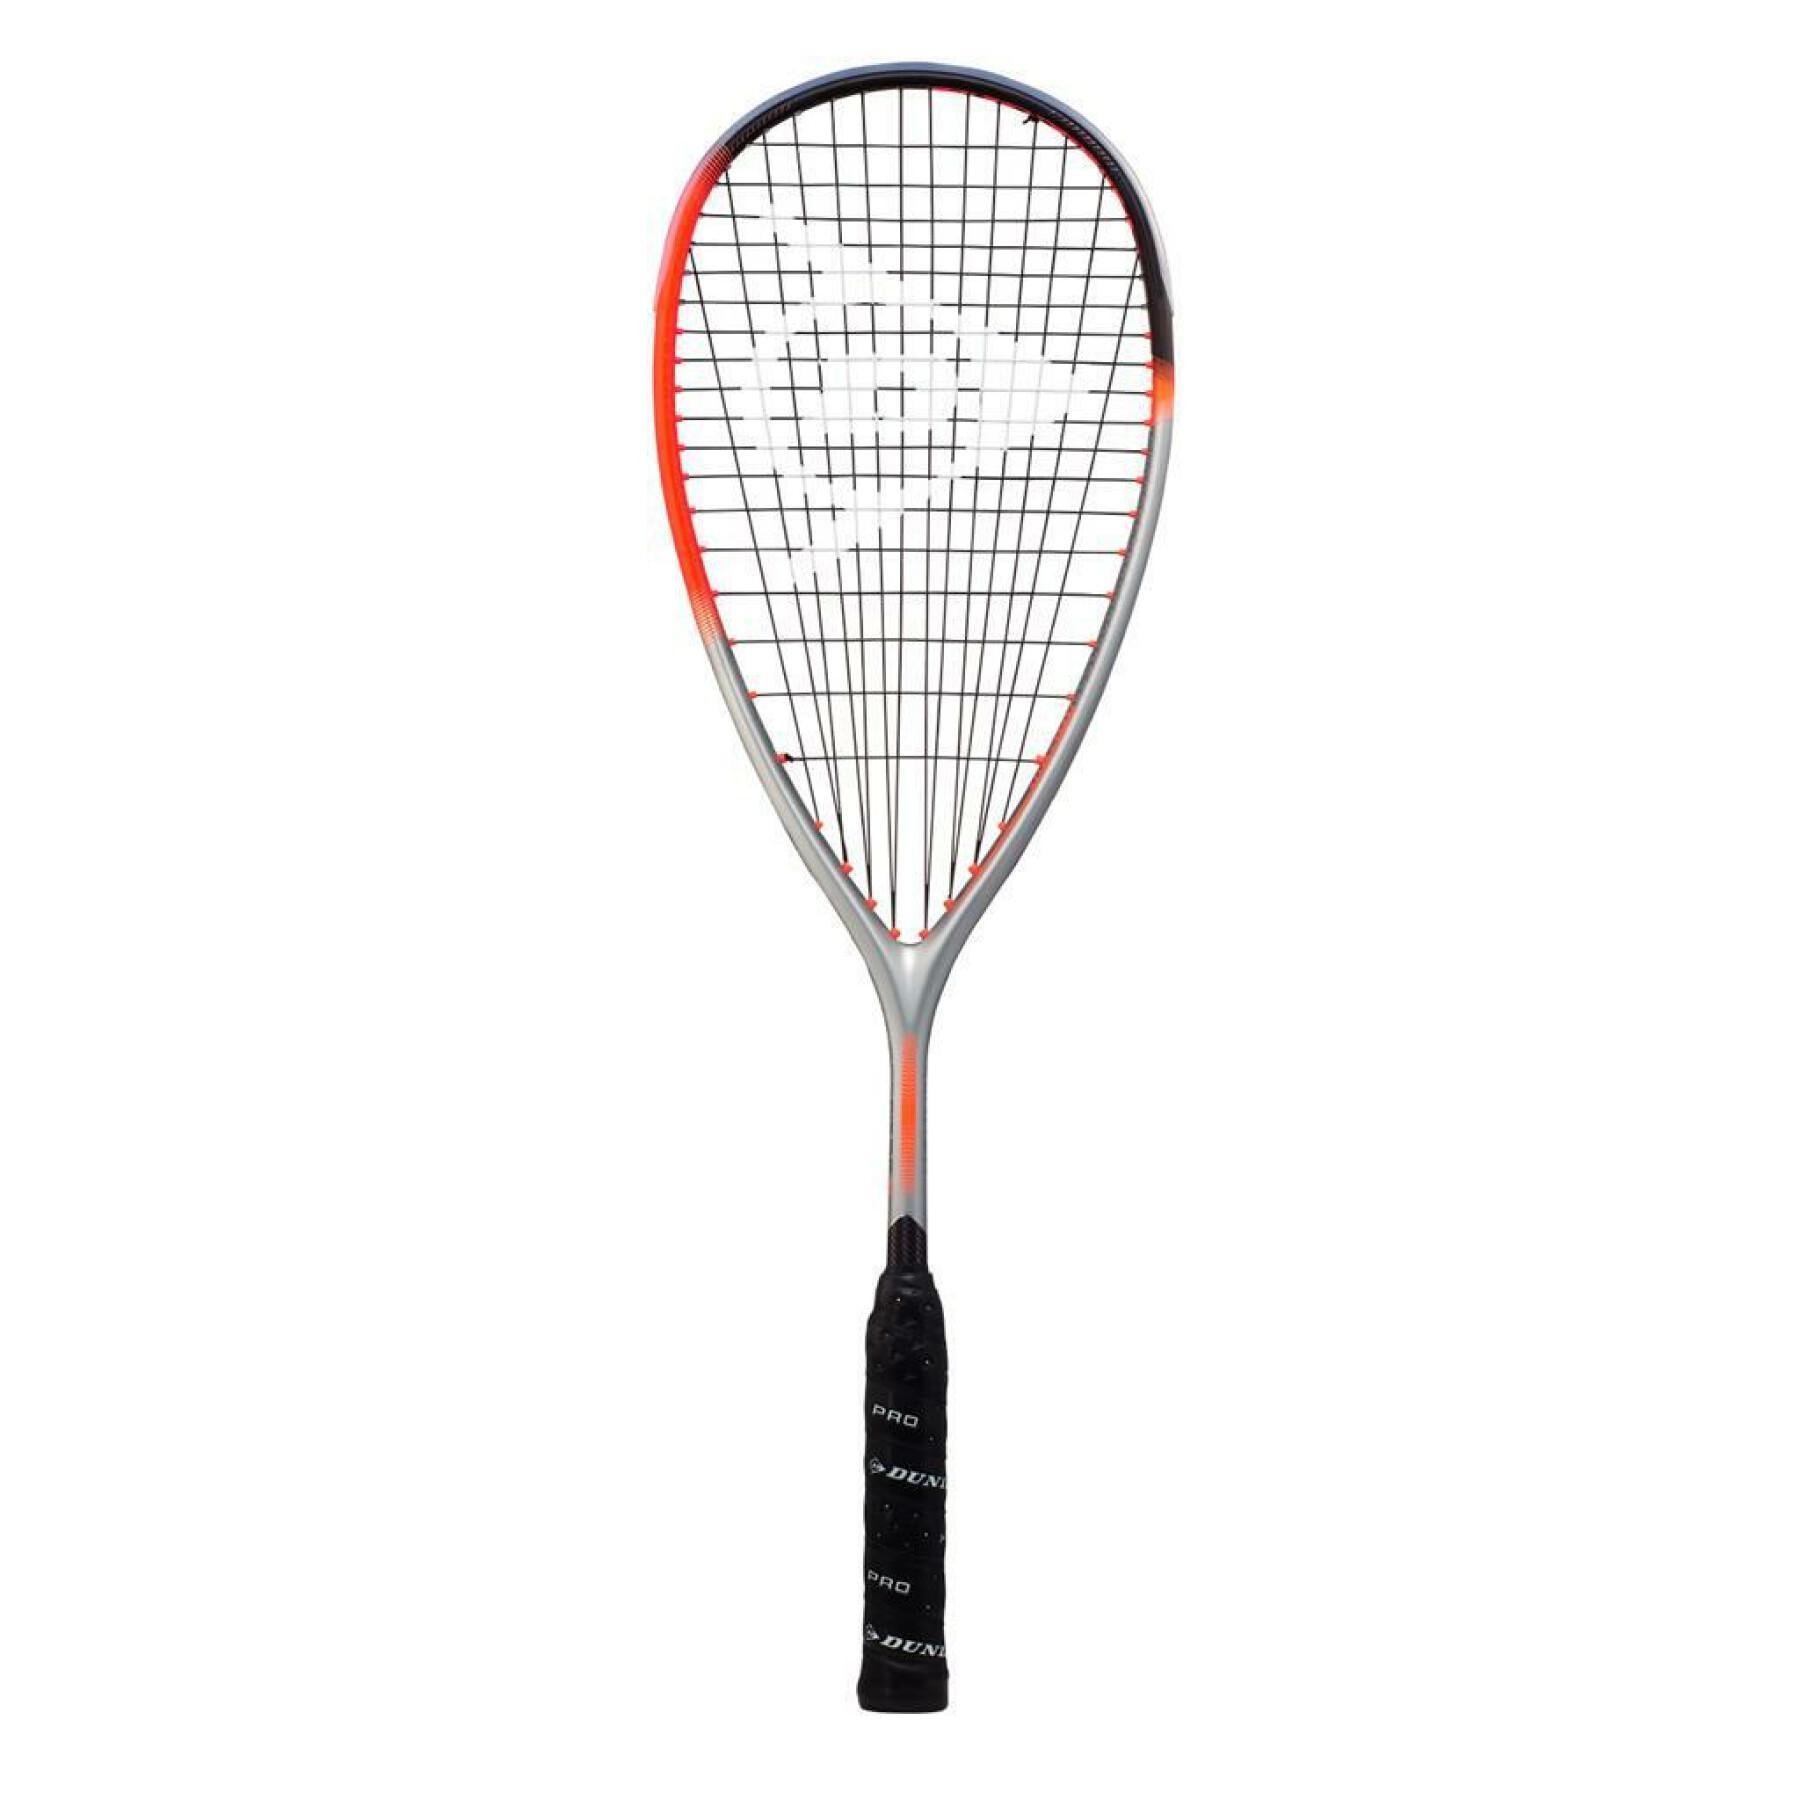 Racket Dunlop hyperfibre revelation 135